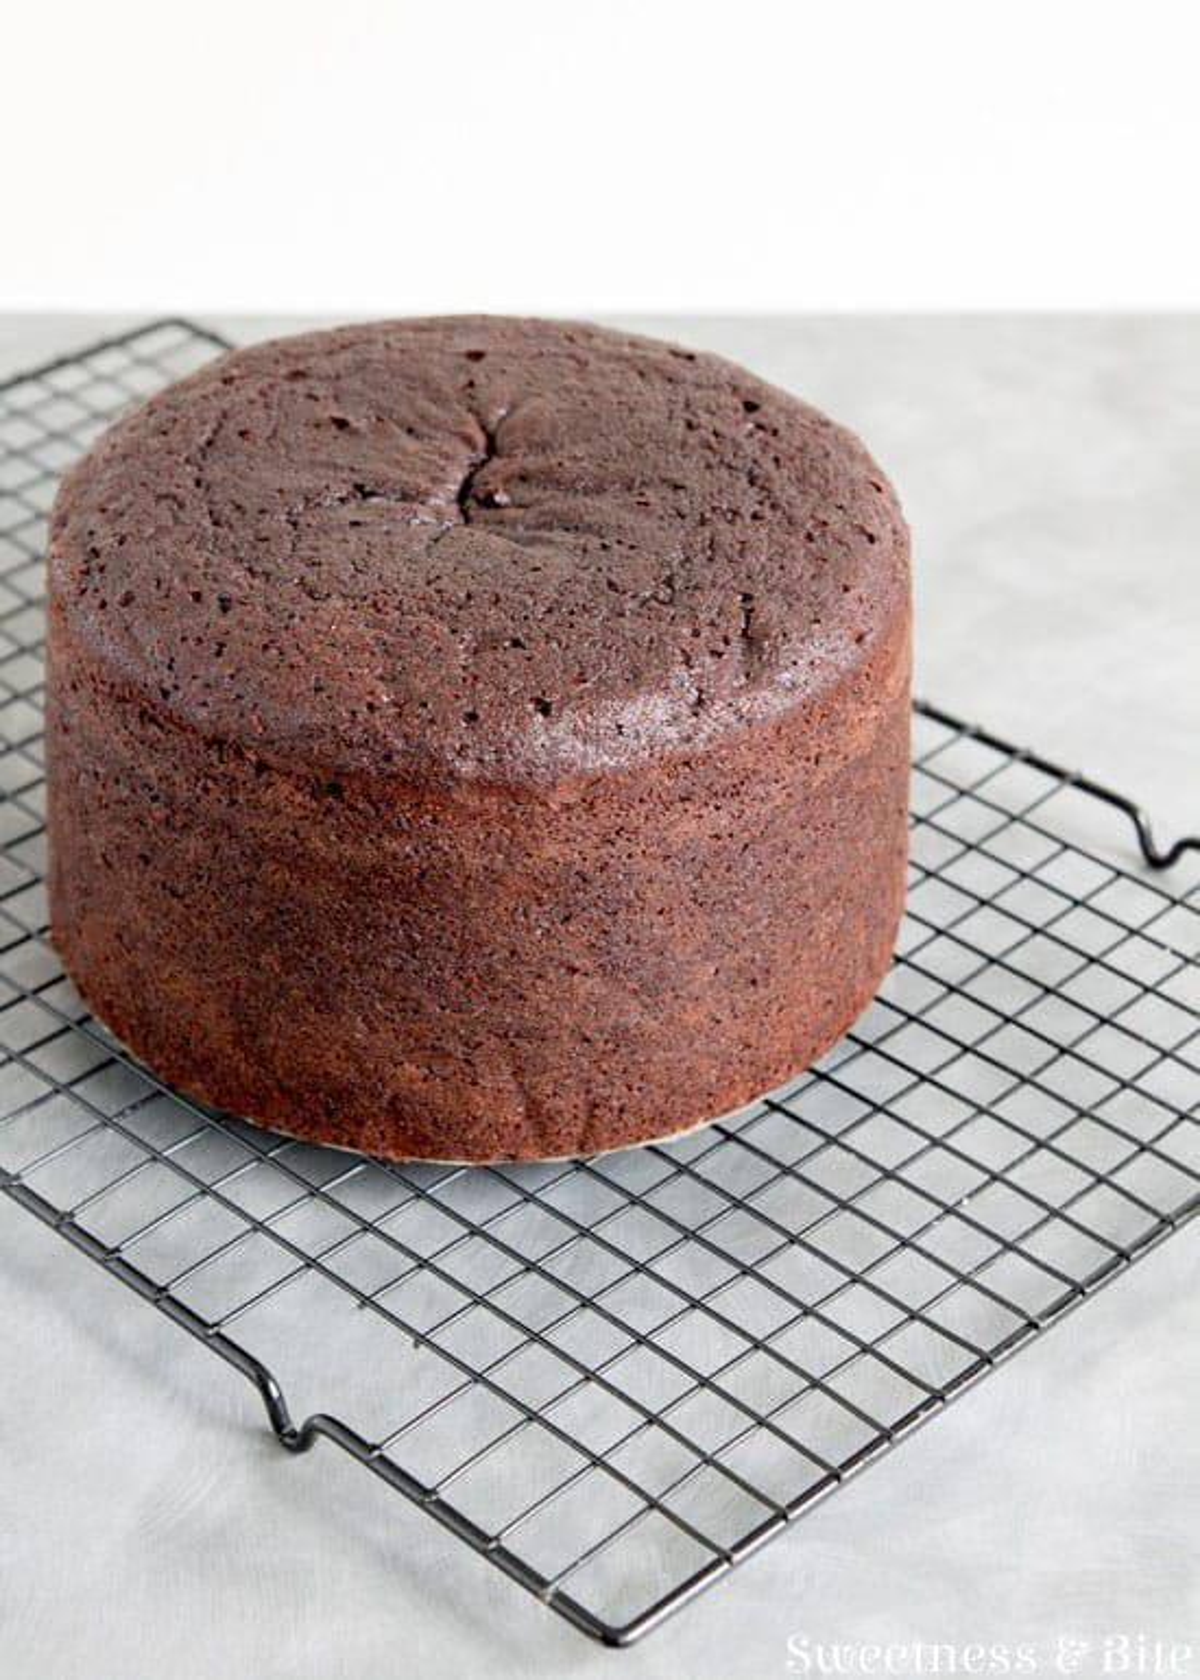 Gluten Free Toasted Almond Chocolate Cake ~ Sweetness & Bite